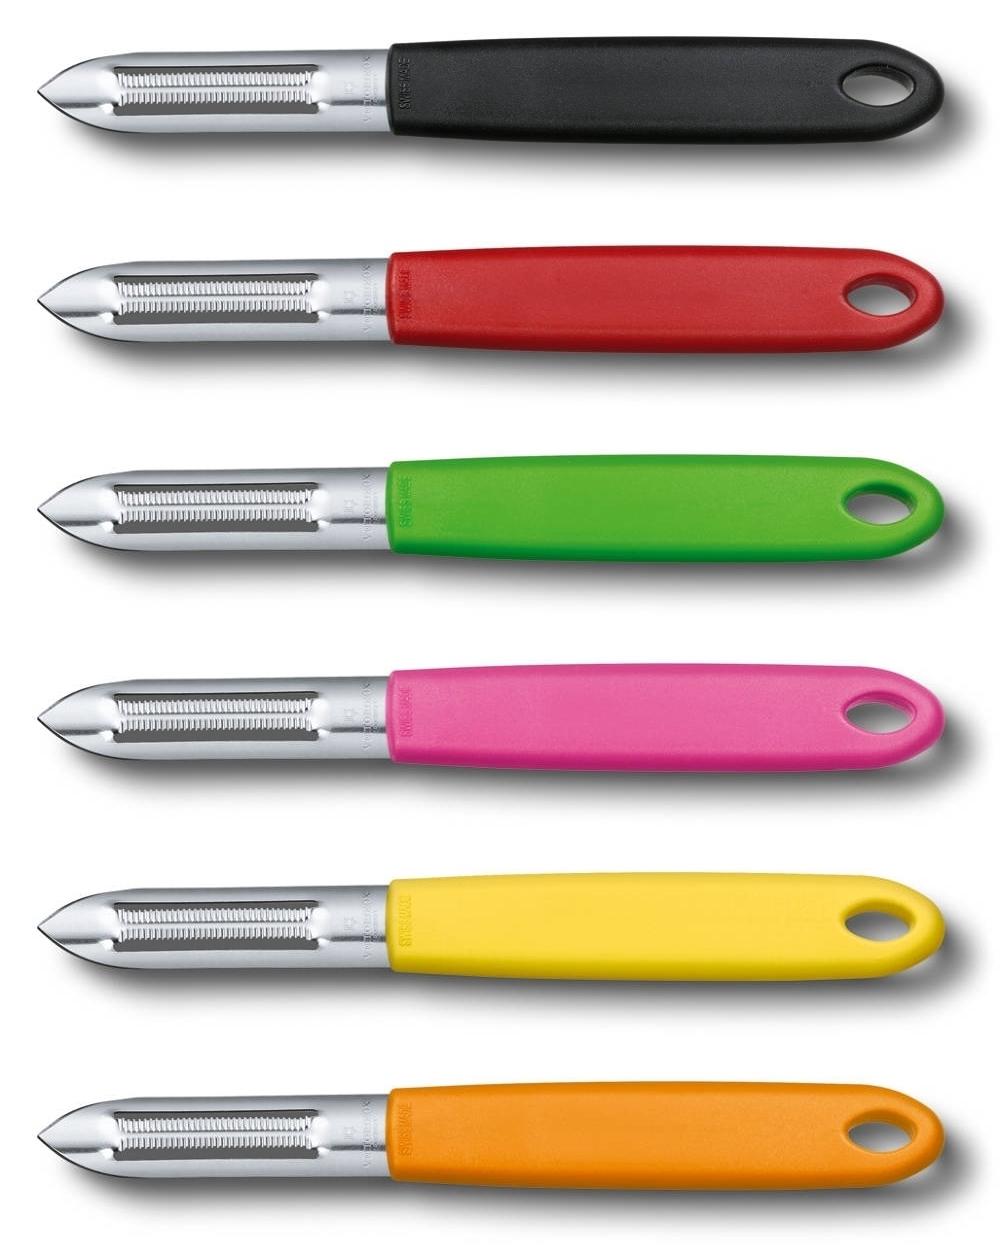 Нож Victorinox для чистки овощей, жёлтый (7.6077.8)